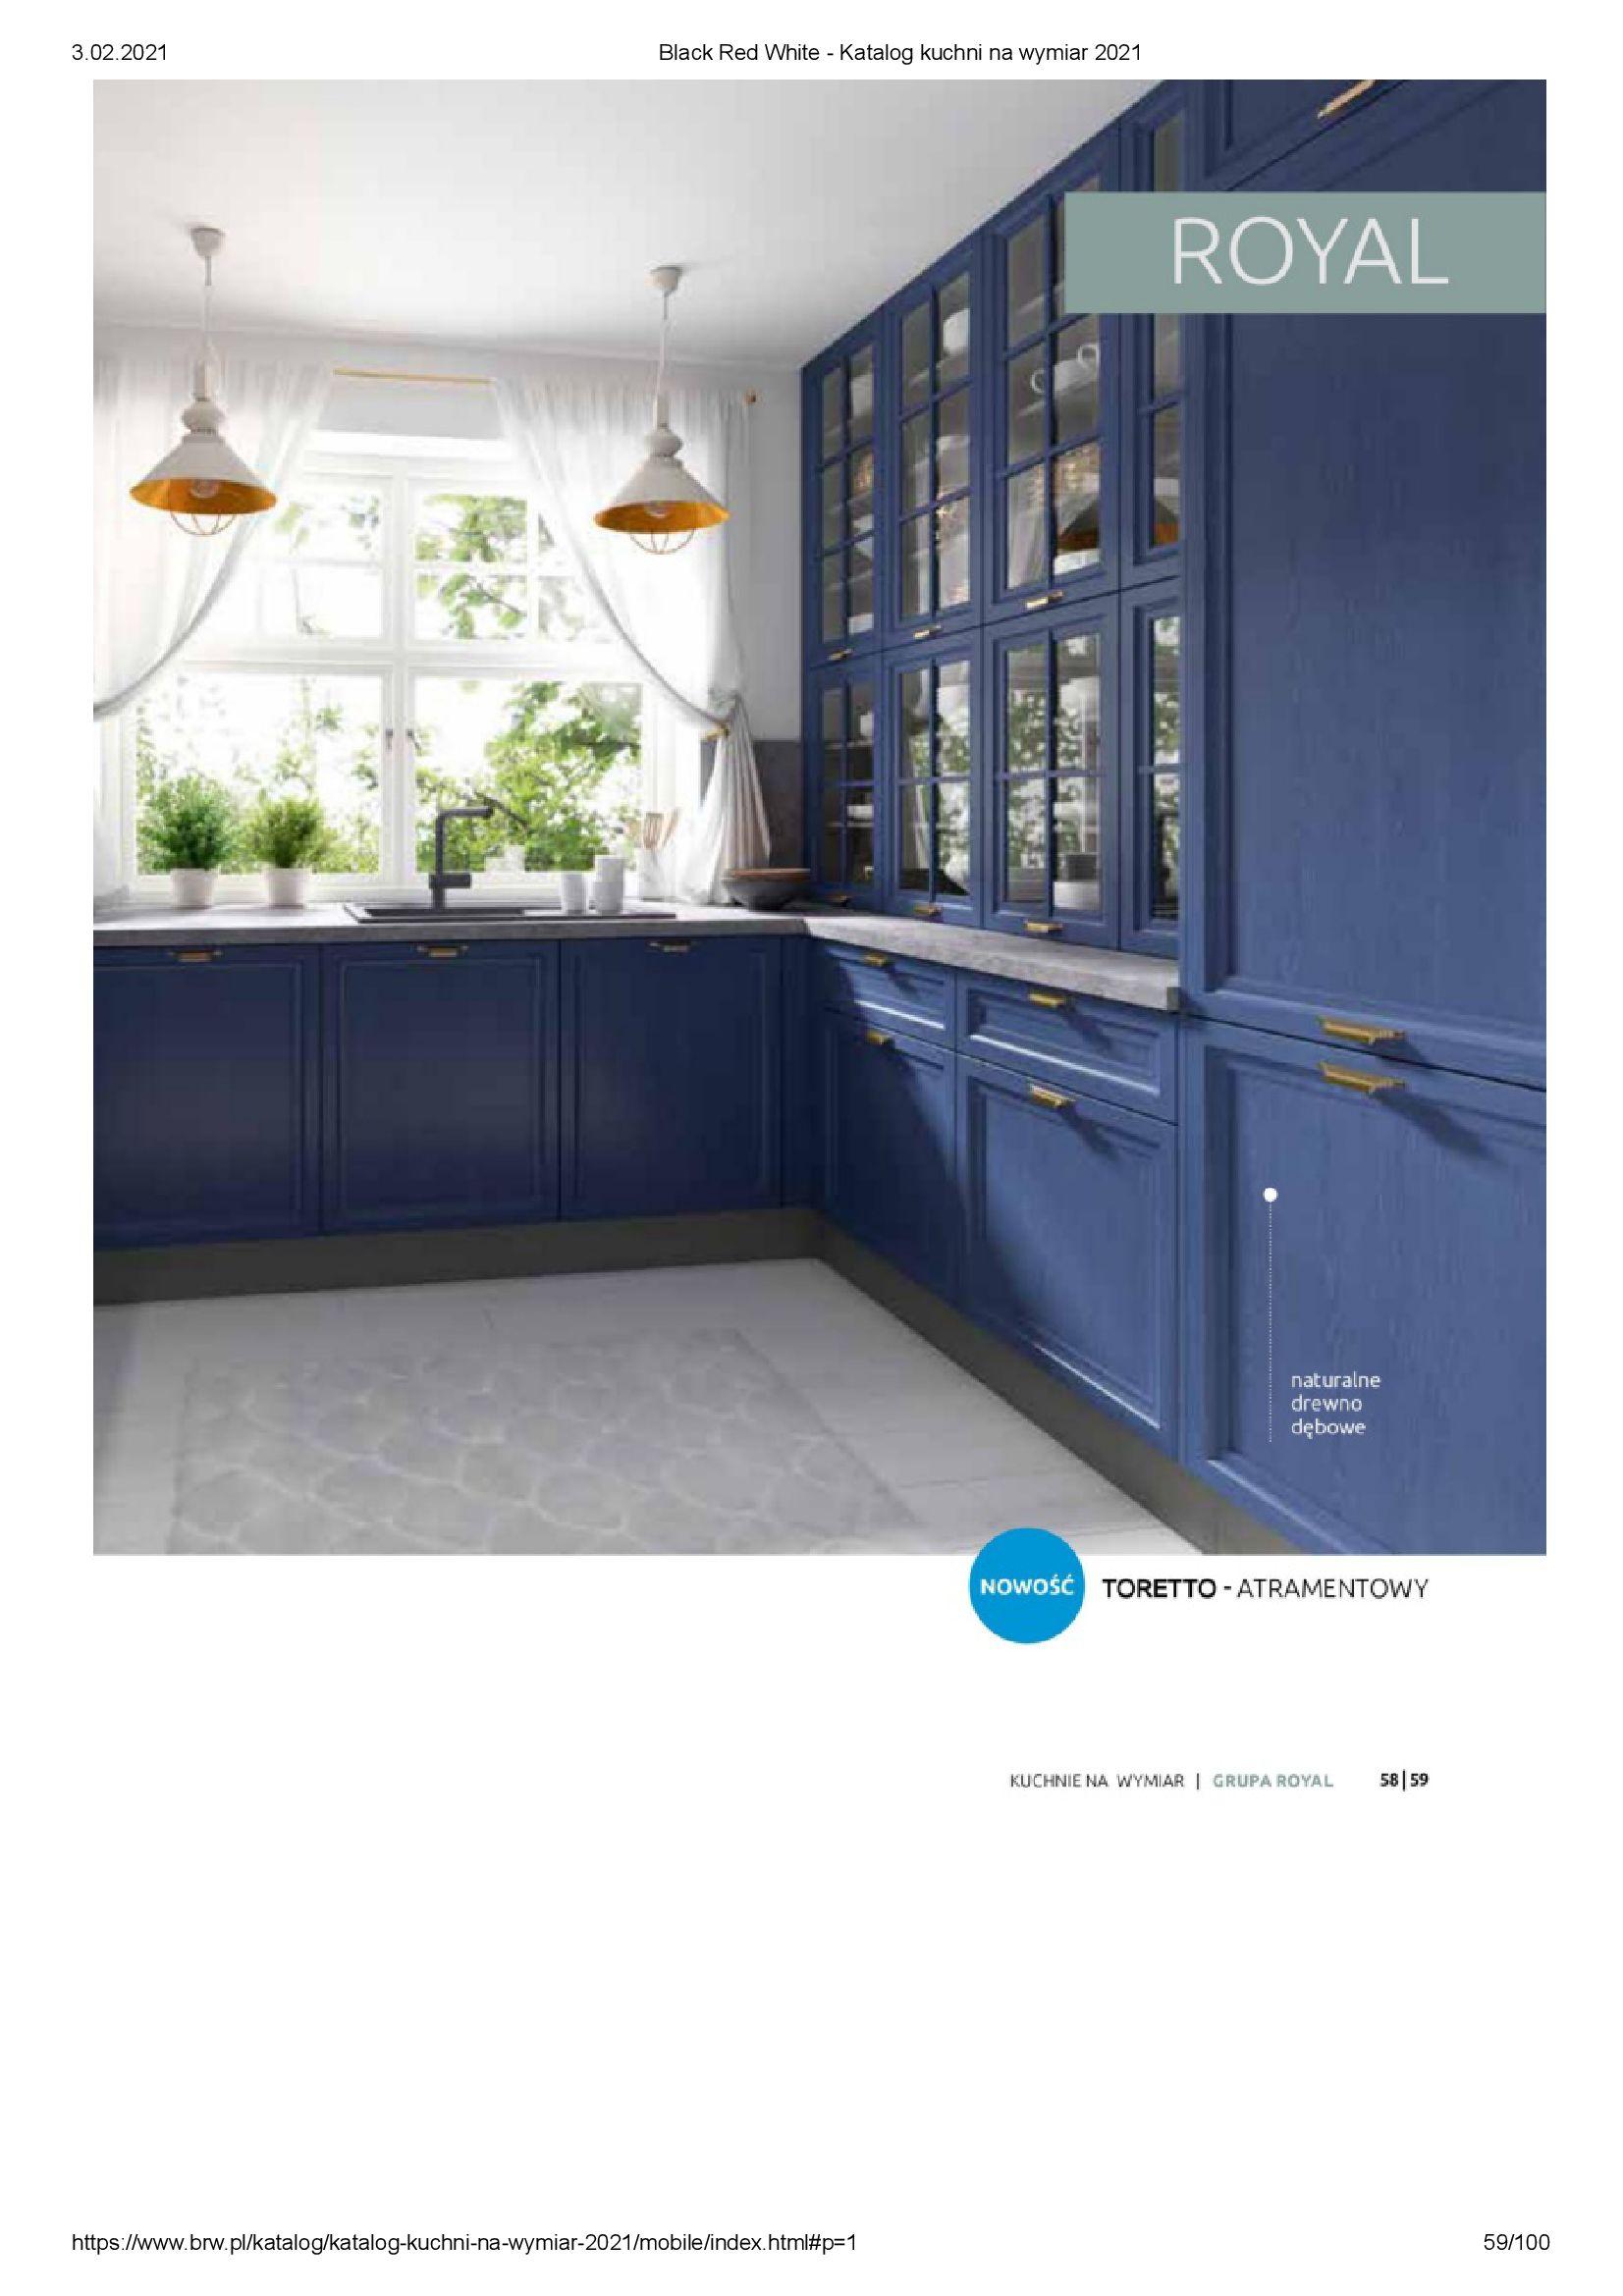 Gazetka Black Red White: Katalog - Kuchnie na wymiar Senso Kitchens 2021 2021-01-01 page-59